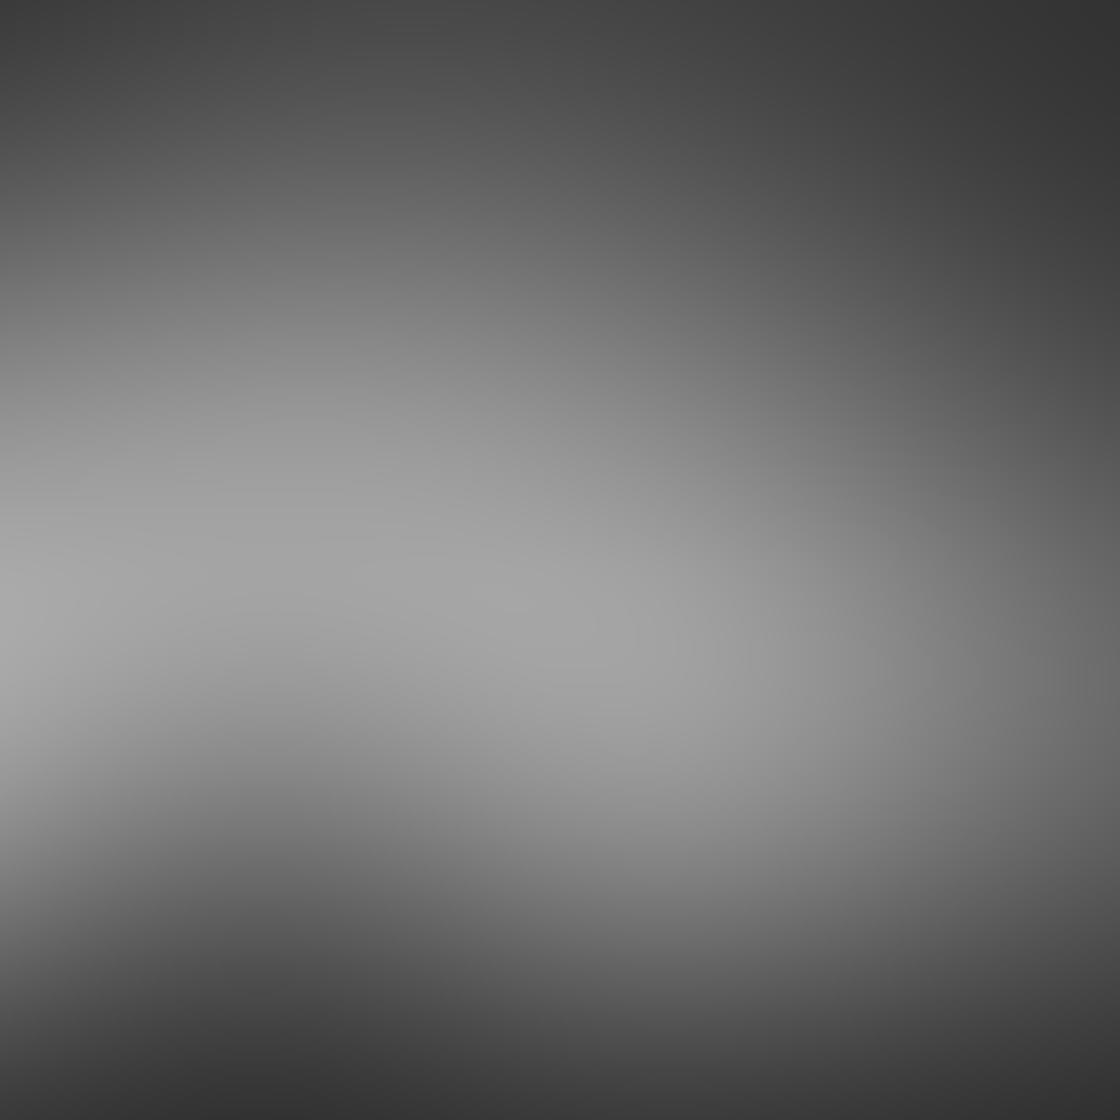 Minimalism Pihone Photography 17